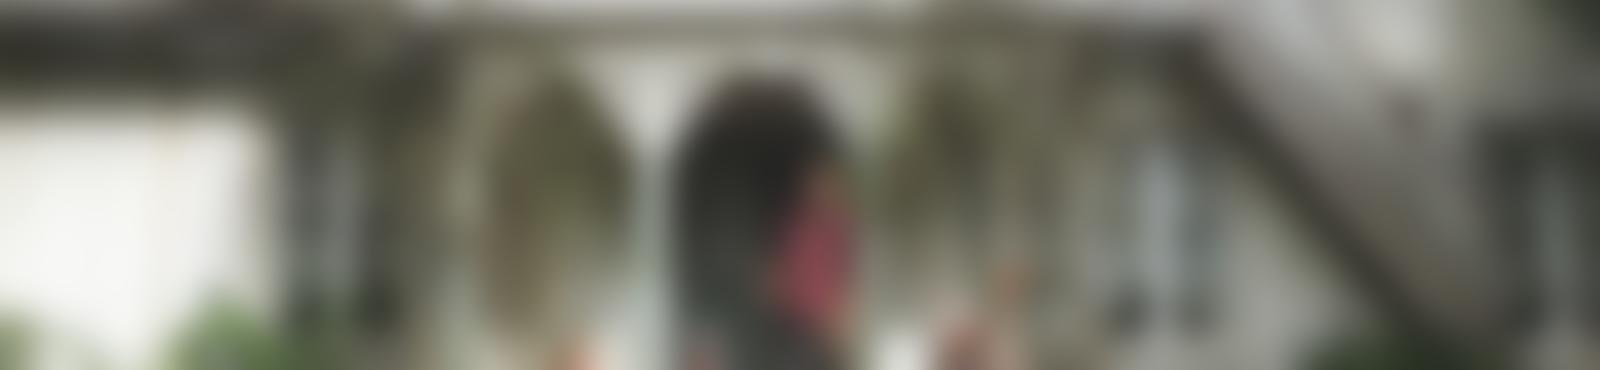 Blurred b5a8f8bb 37ad 462e a01c fd9f22d2578b